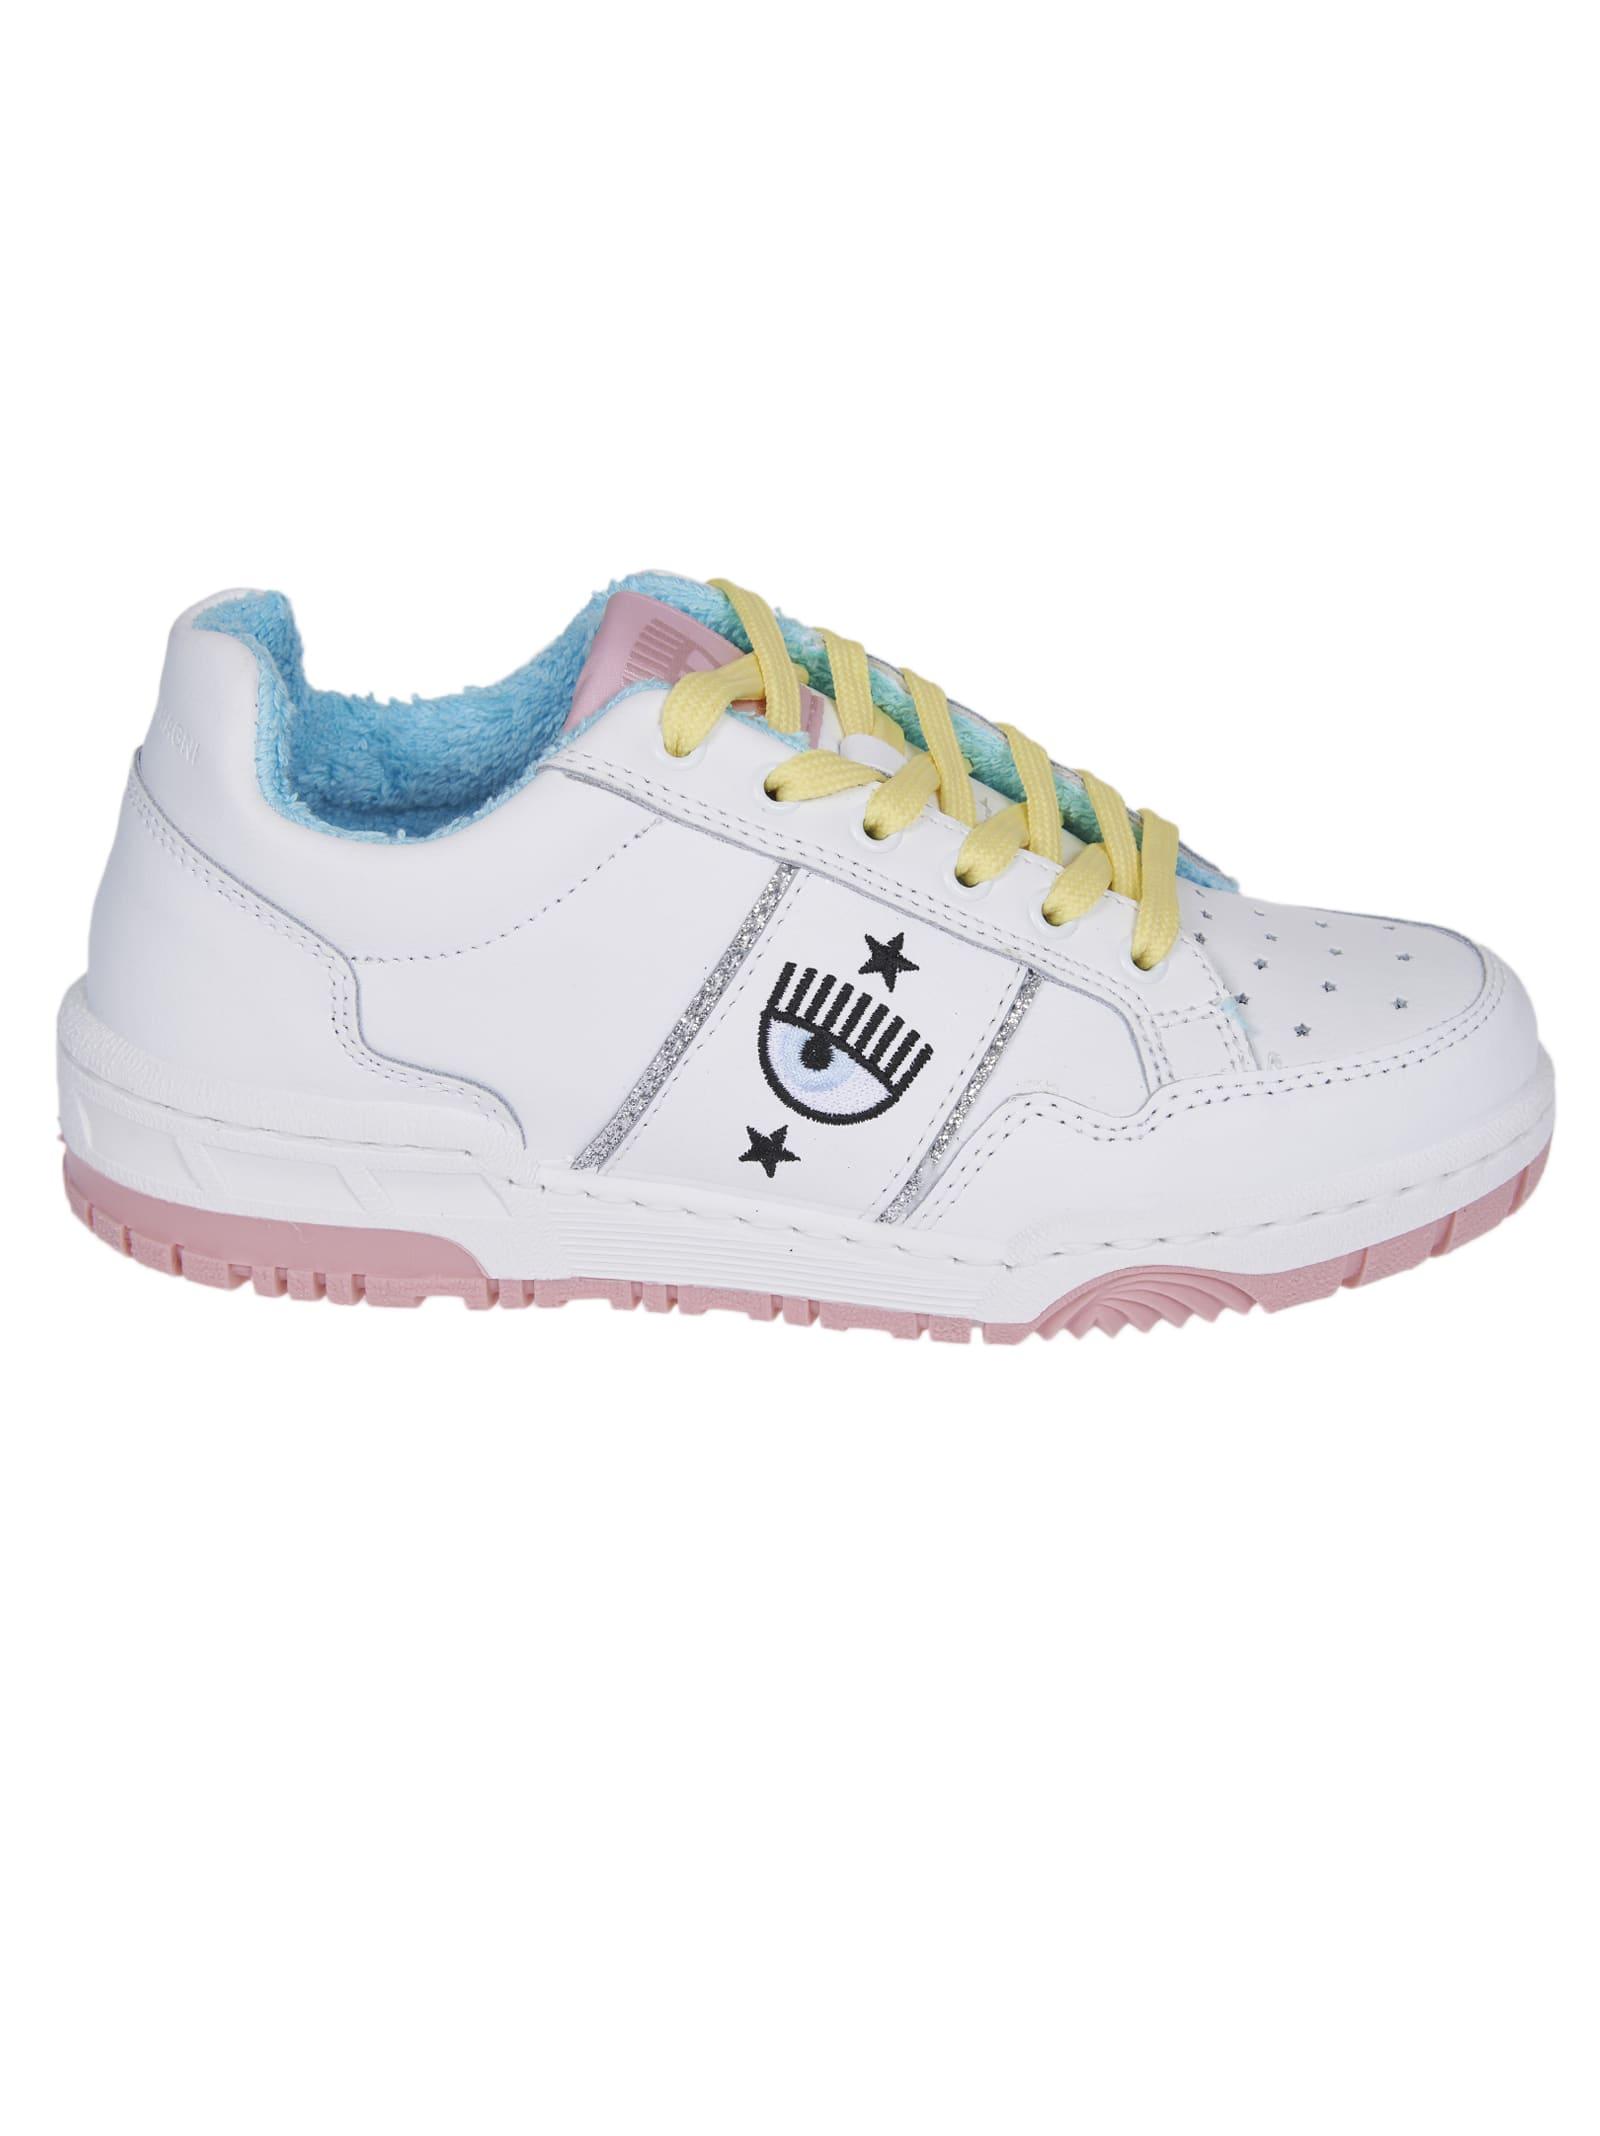 Chiara Ferragni Sneakers WHITE CF-1 SNEAKERS